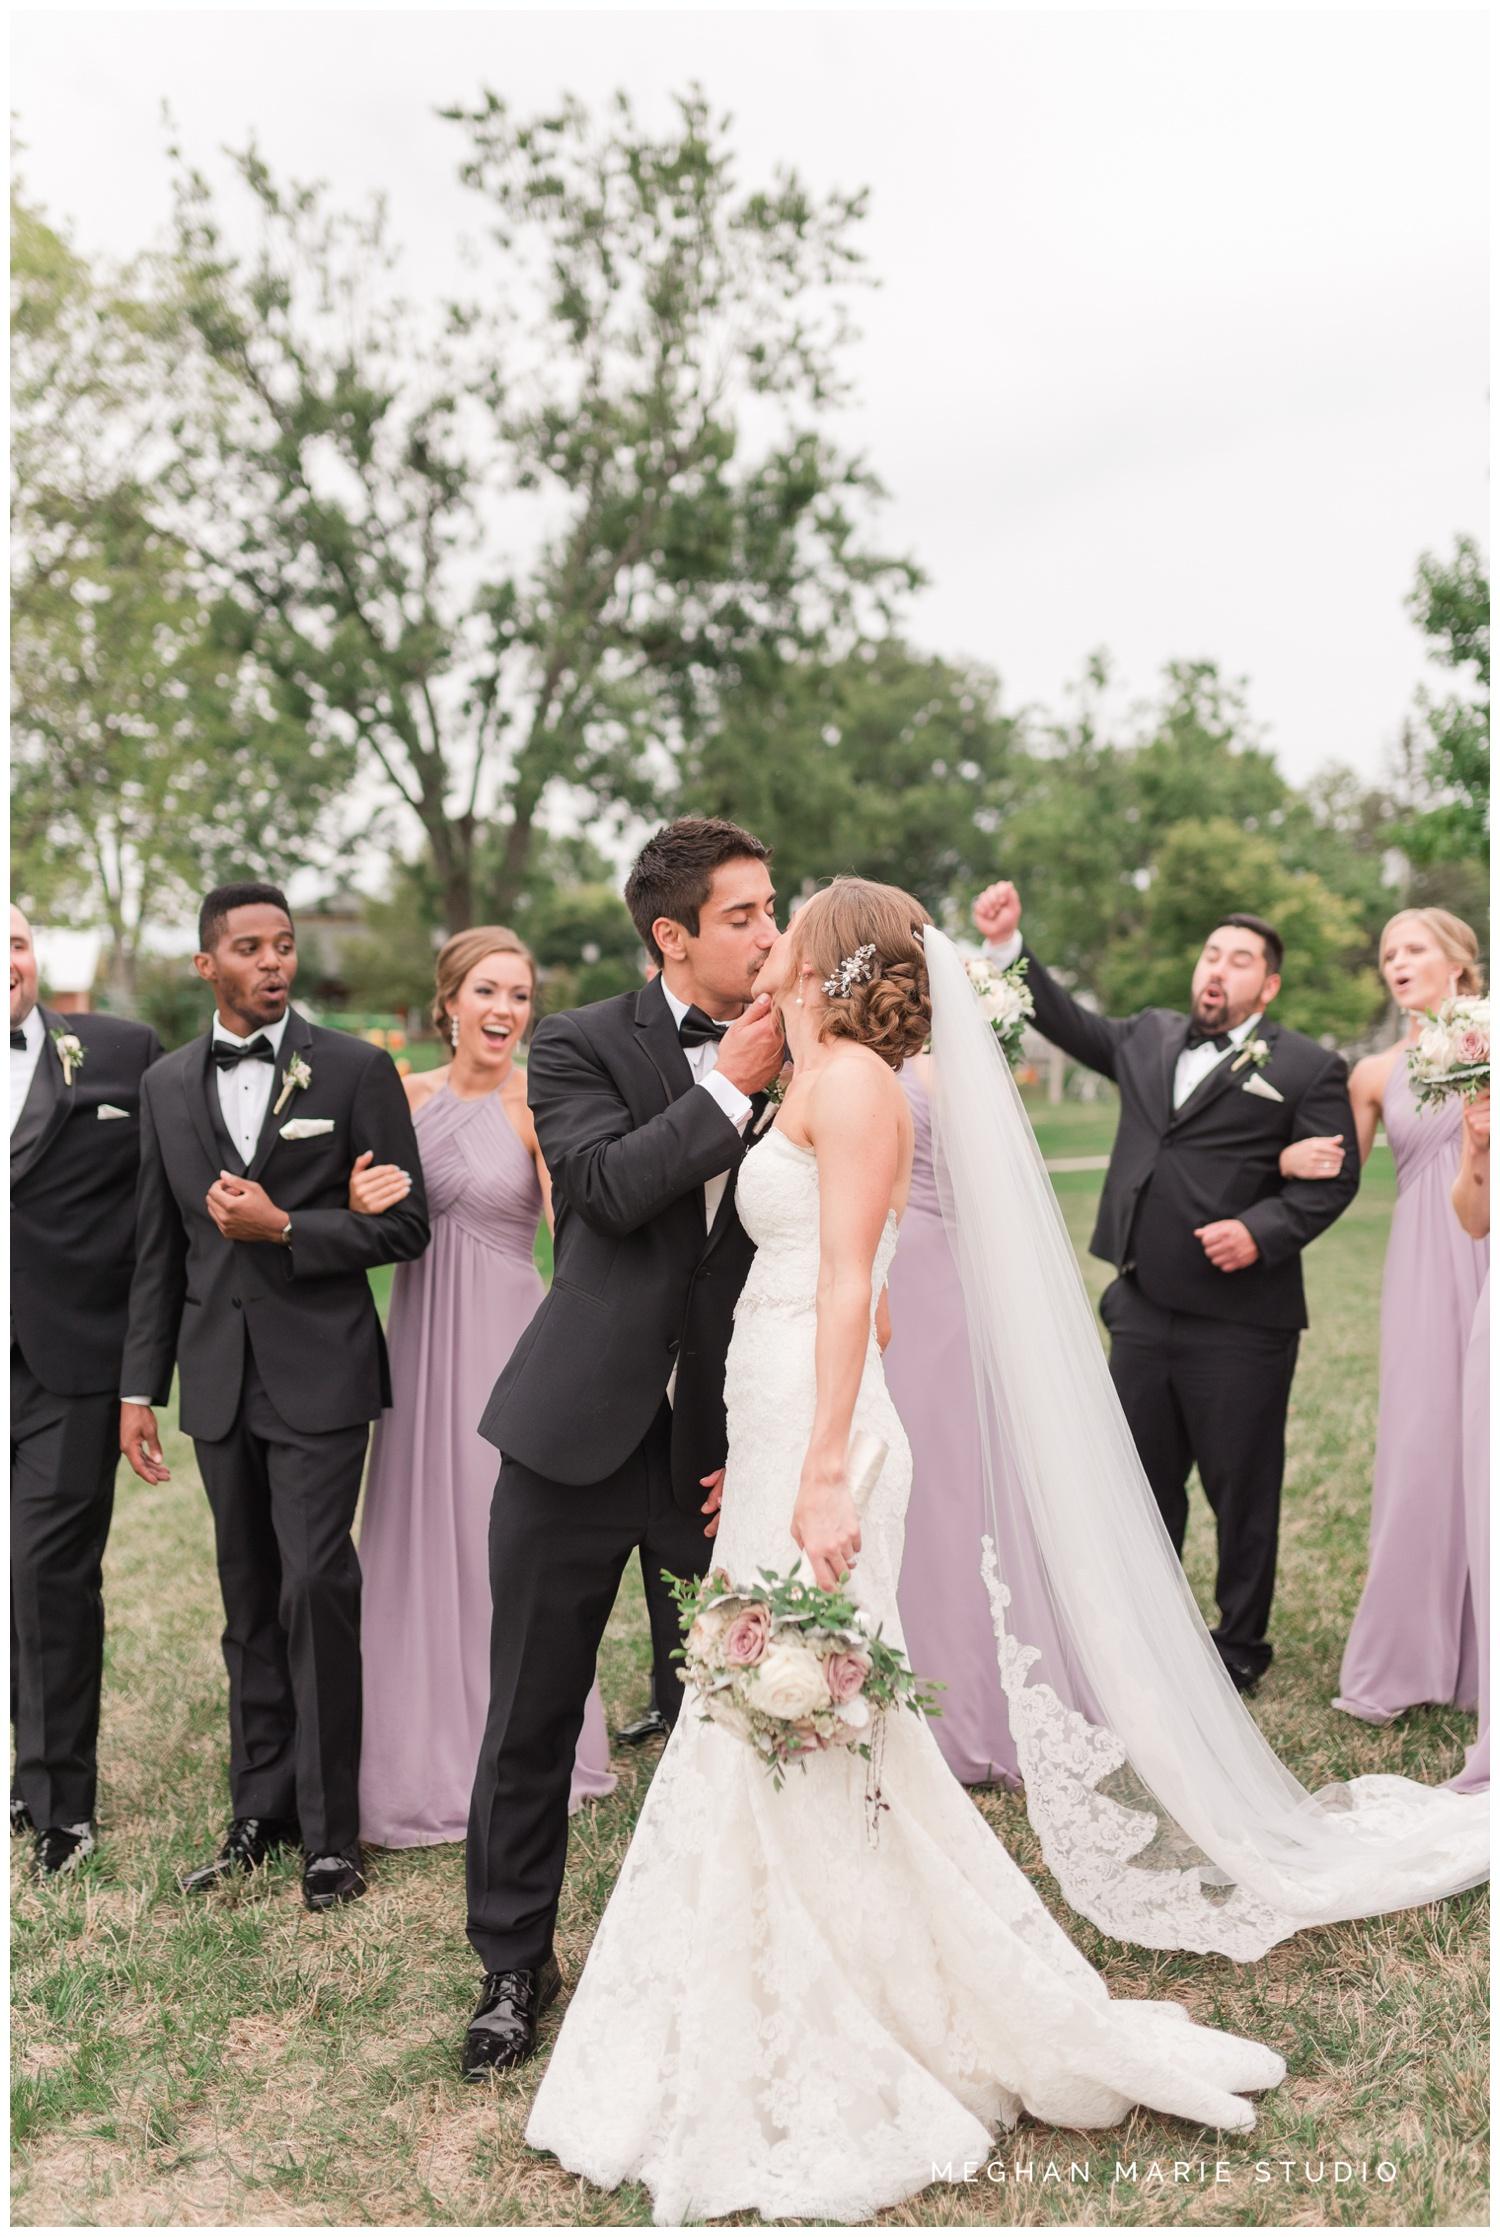 meghan marie studio wedding photographer ohio dayton cincinnati columbus minster st augustine dusty purple rose interracial couple romers catering_0734a.jpg